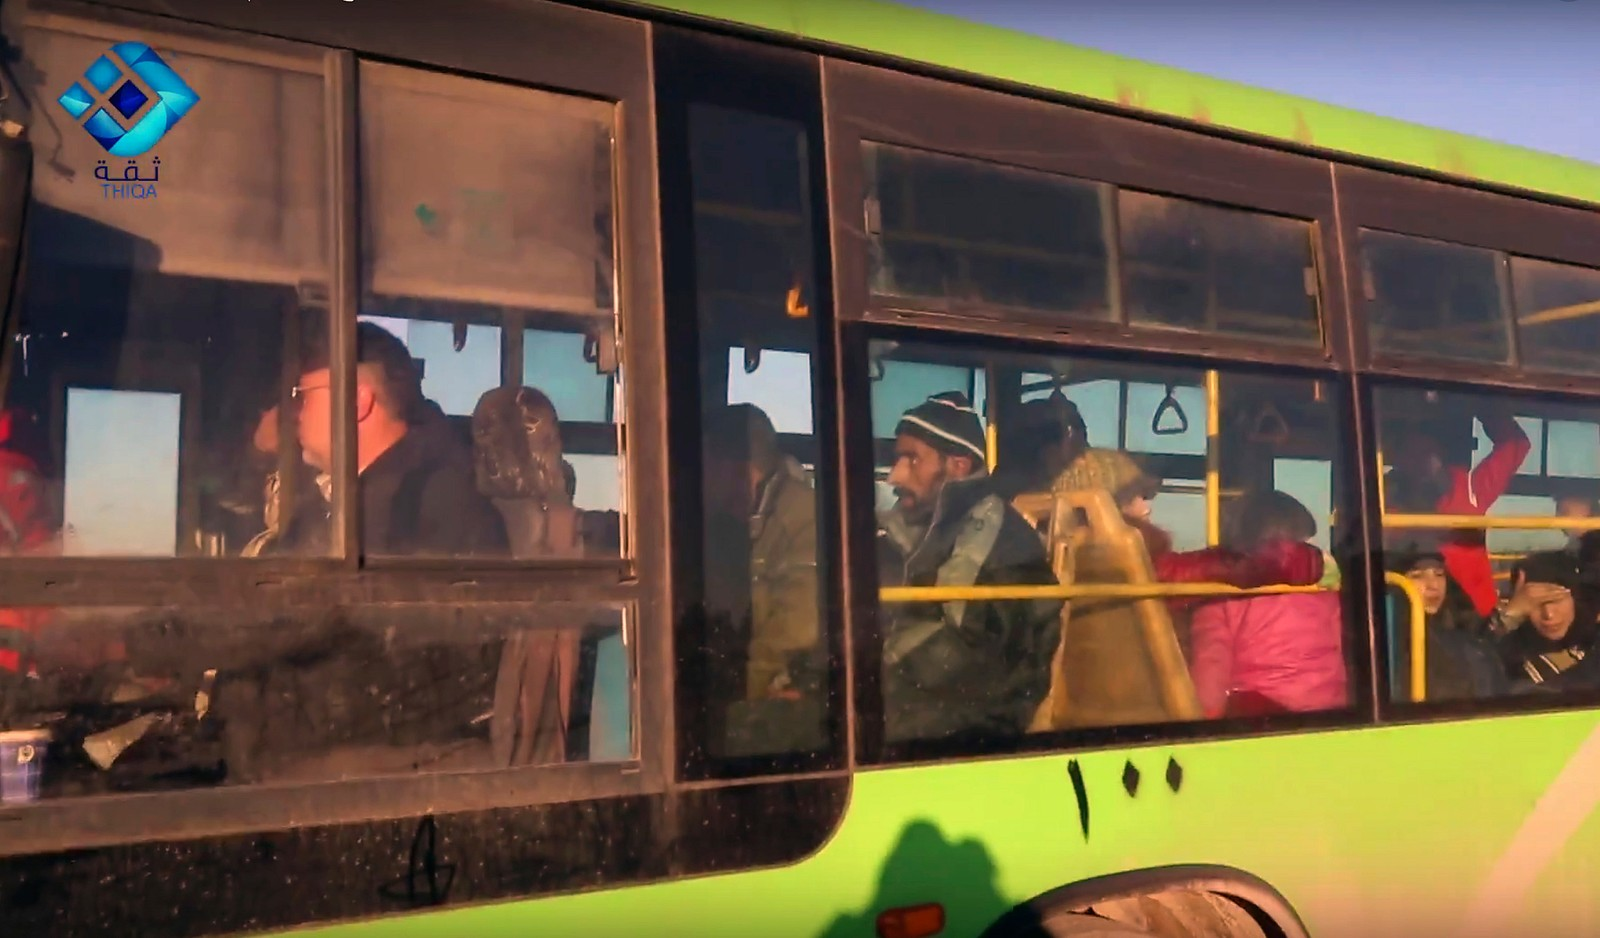 Evakuerte om bord i buss ut av Øst-Aleppo (Thiqa News via AP)